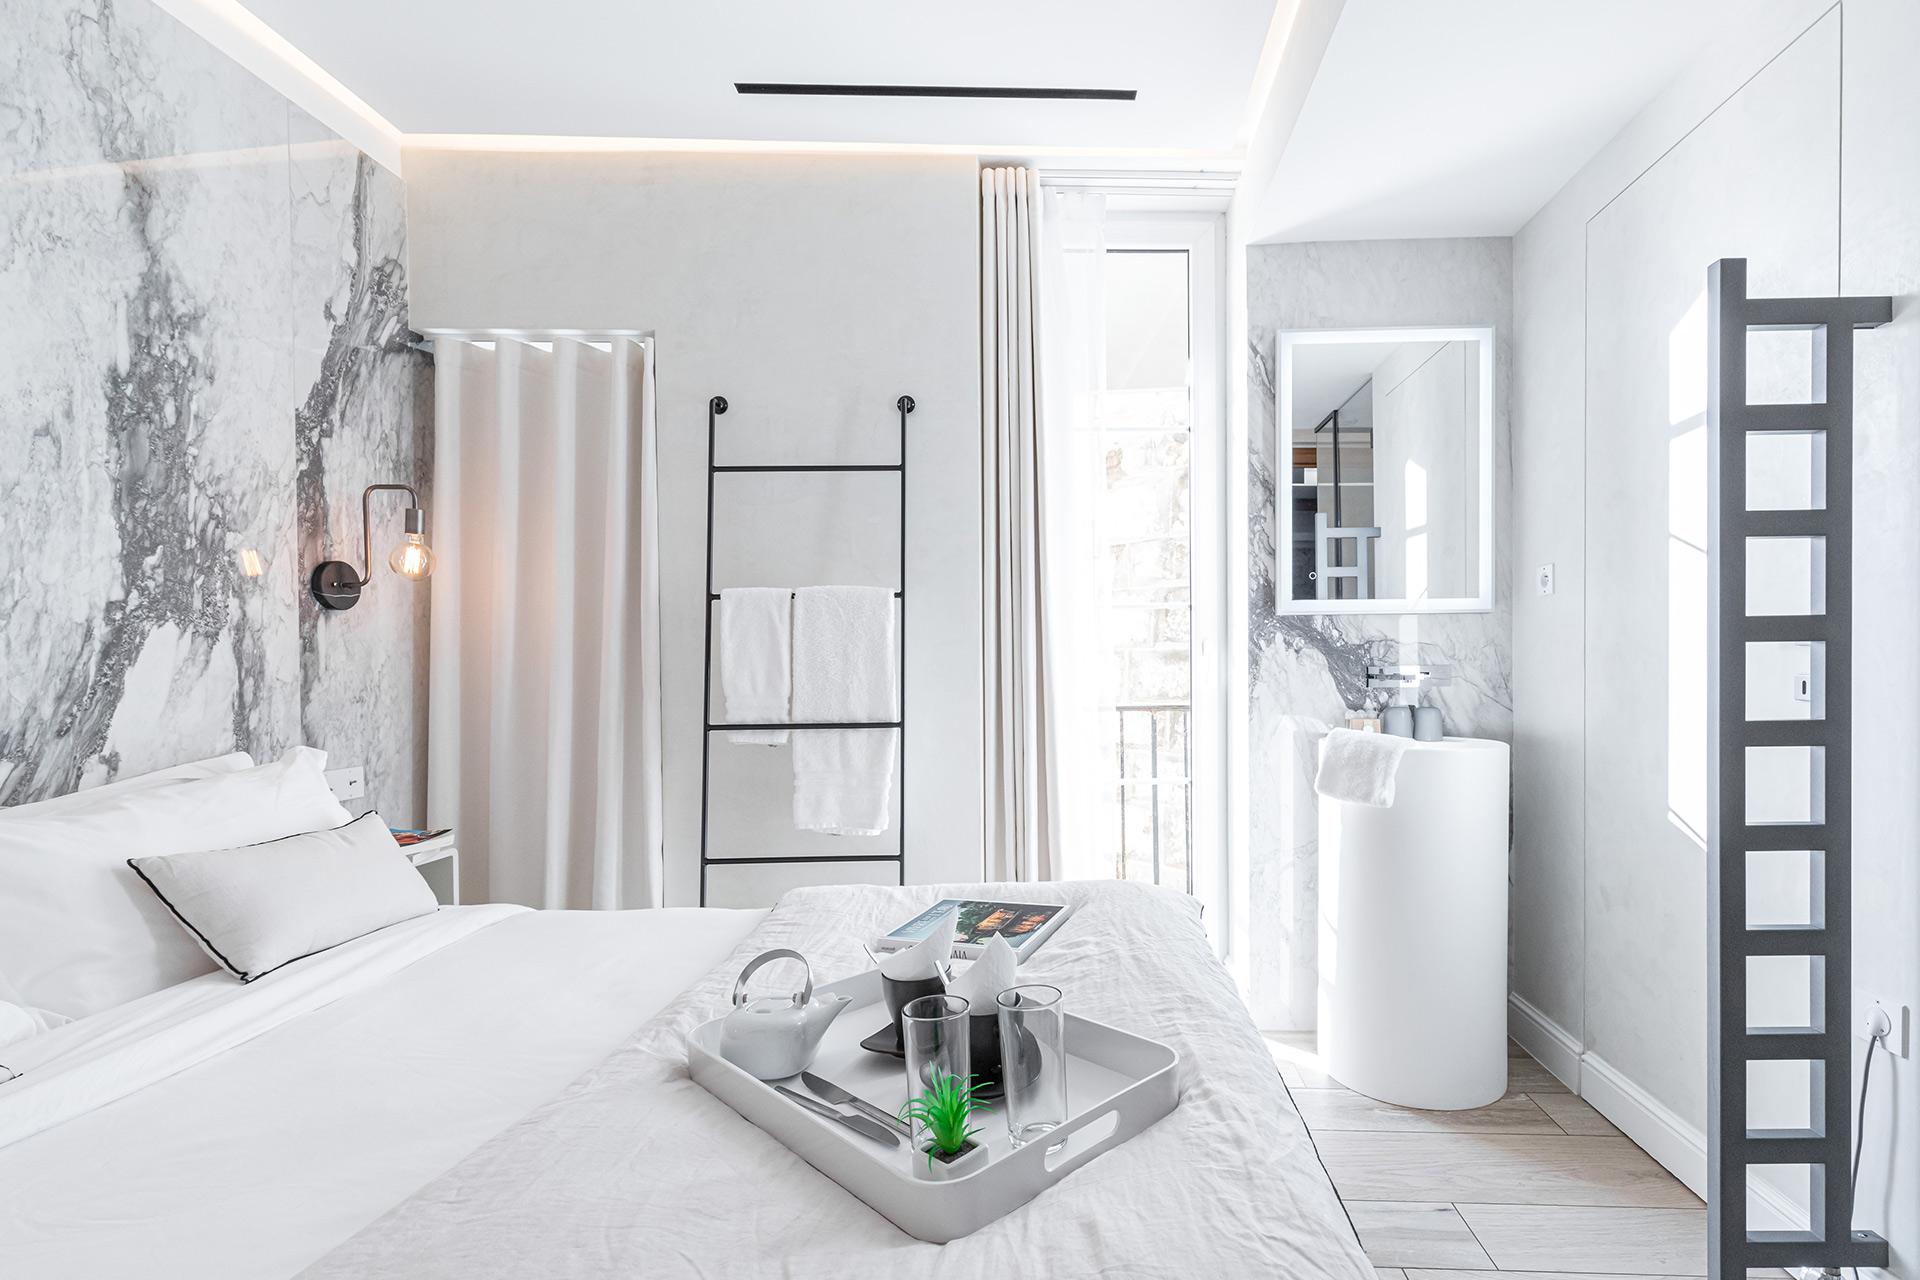 le-dortoir-nice-chambre-double-7678